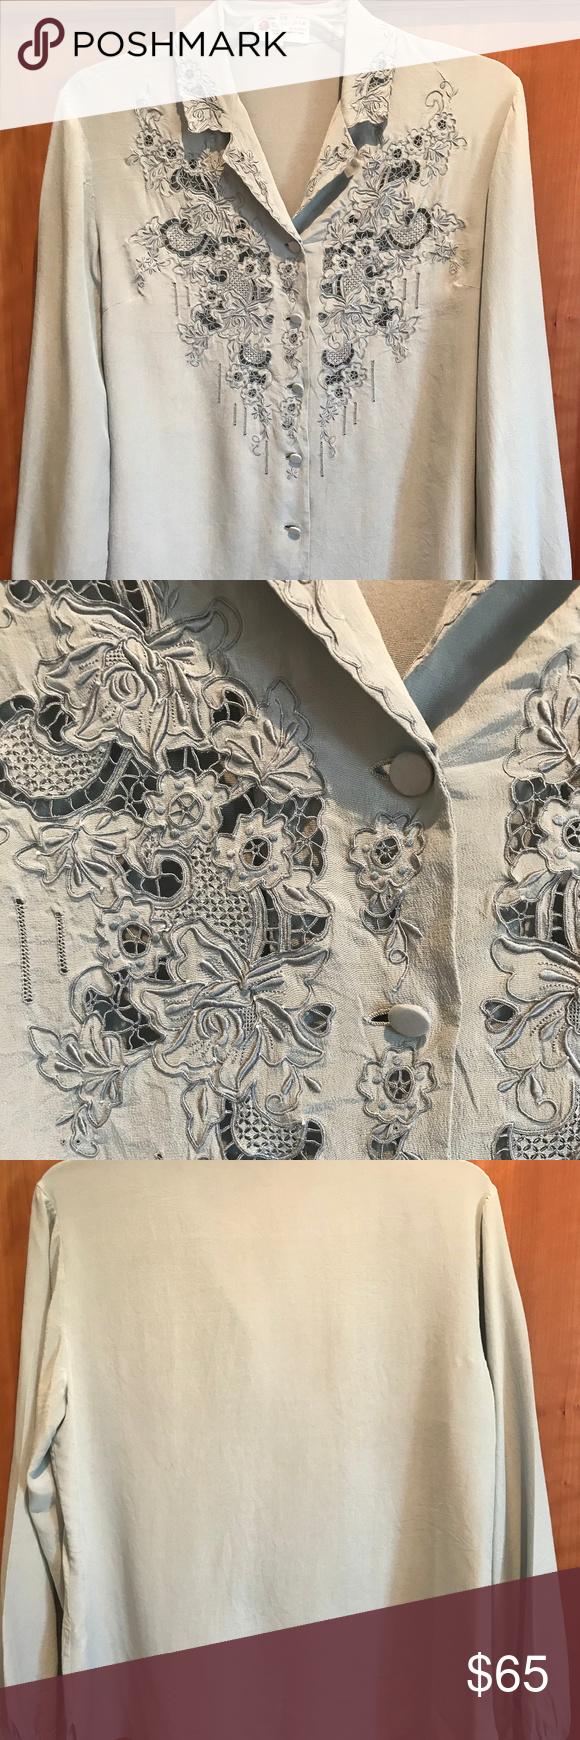 030b46323800ec China · Peony hand embroidered 100% silk blue gray blouse Vintage Peony  brand hand embroidered 100